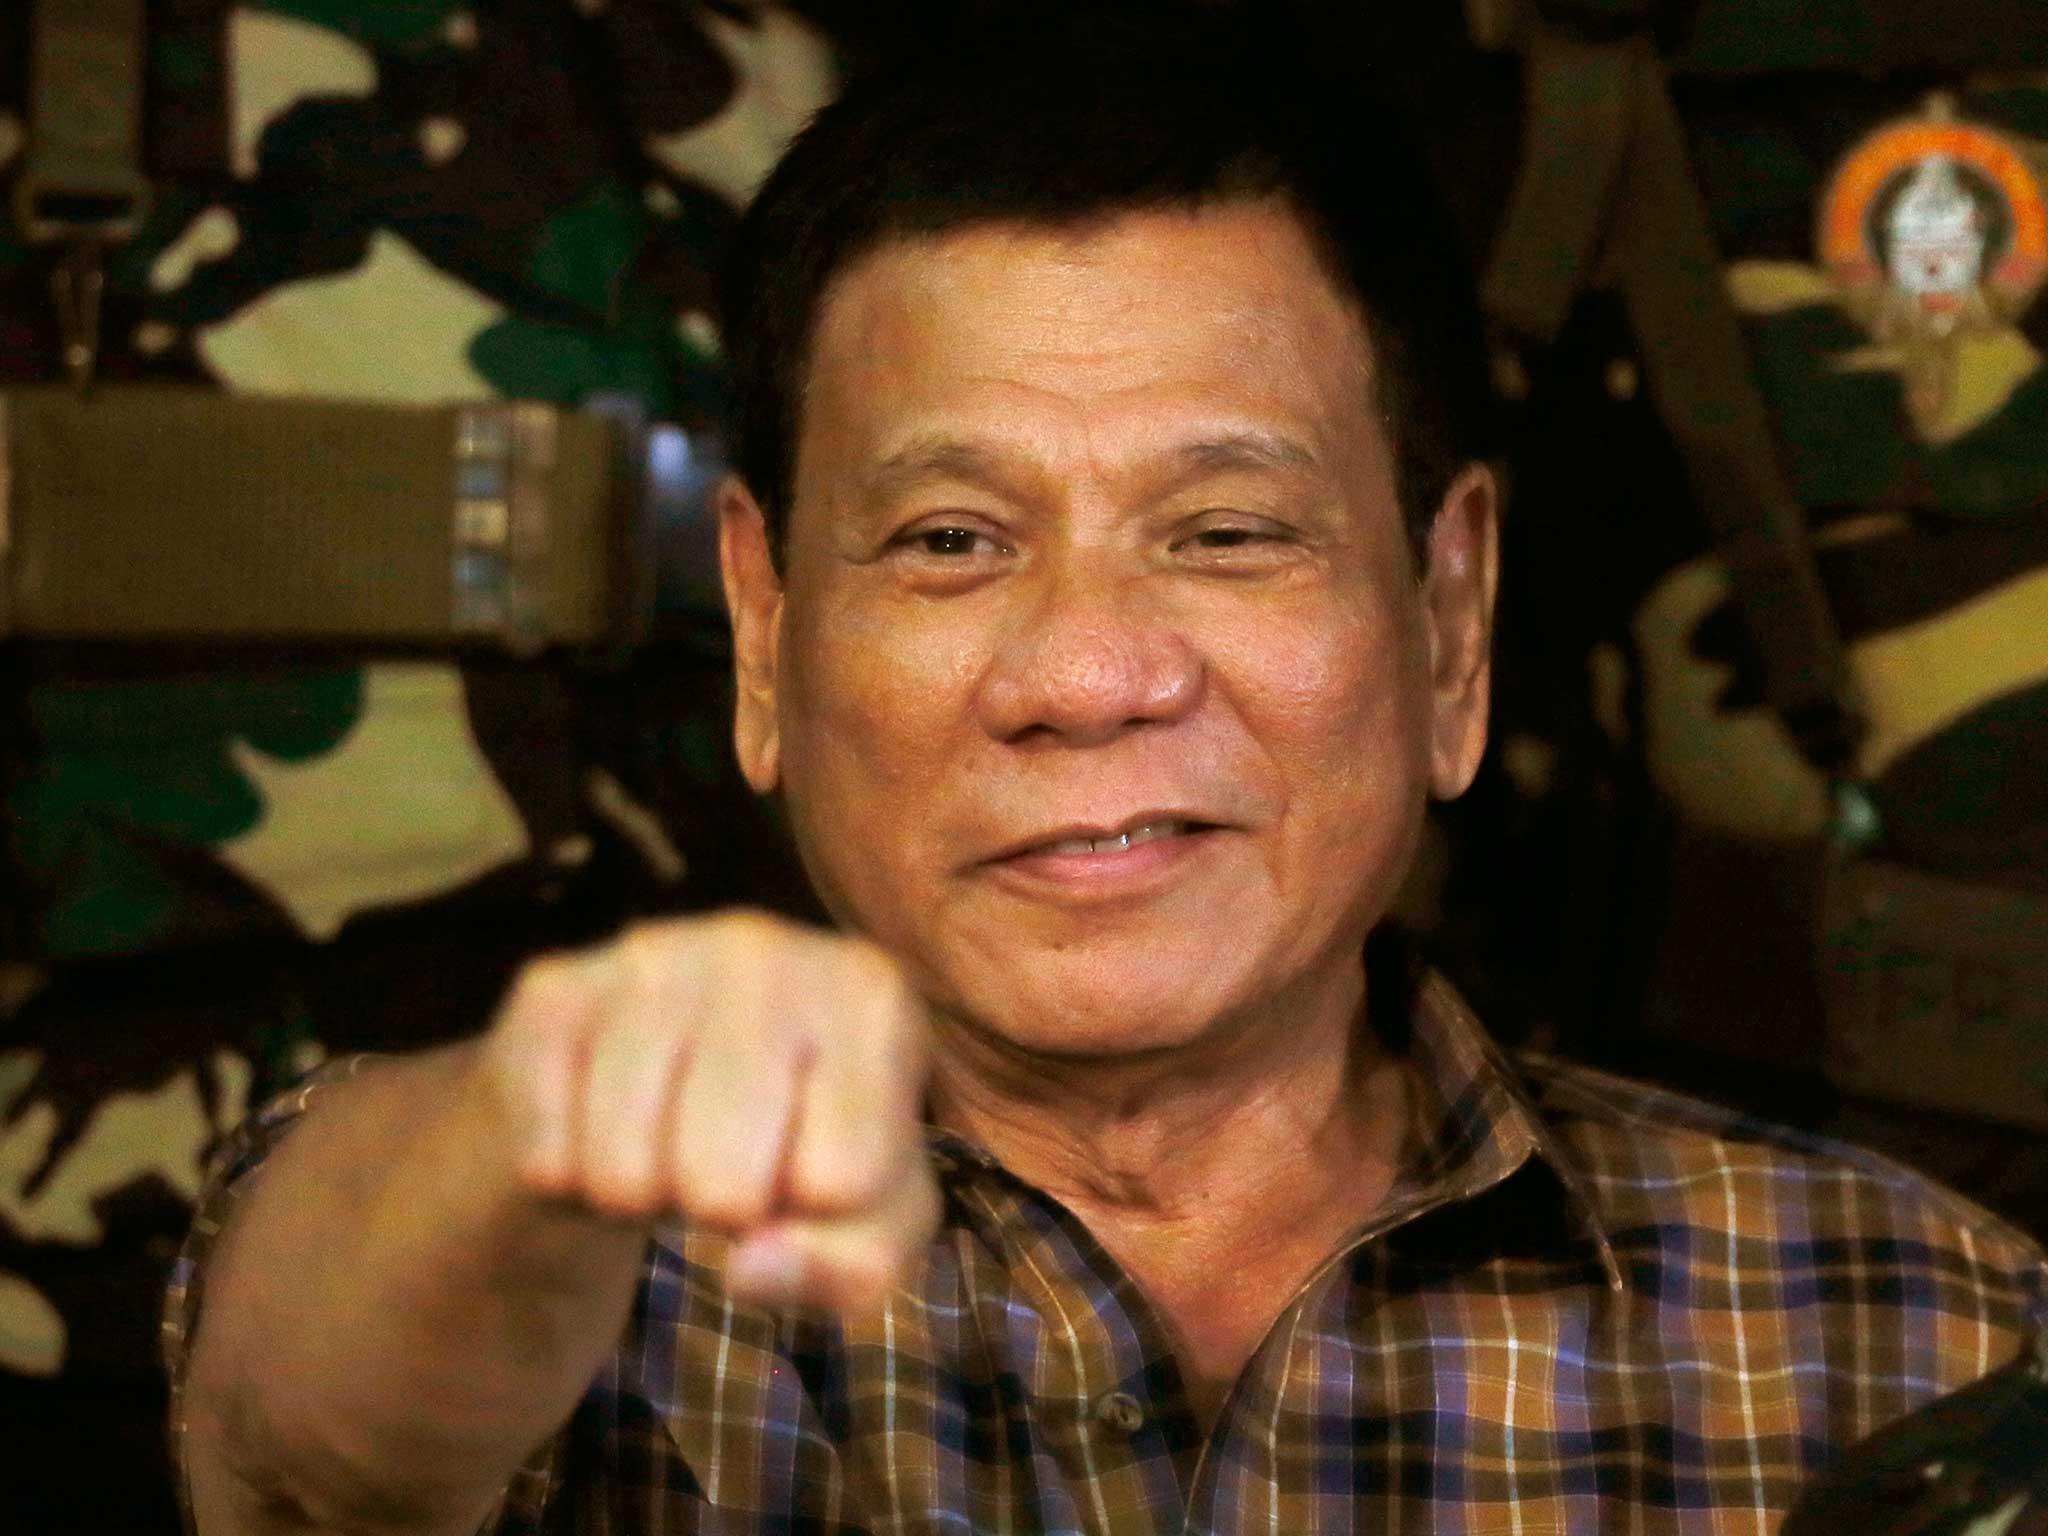 Philippines president Rodrigo Duterte is a psychopath says 2048x1536